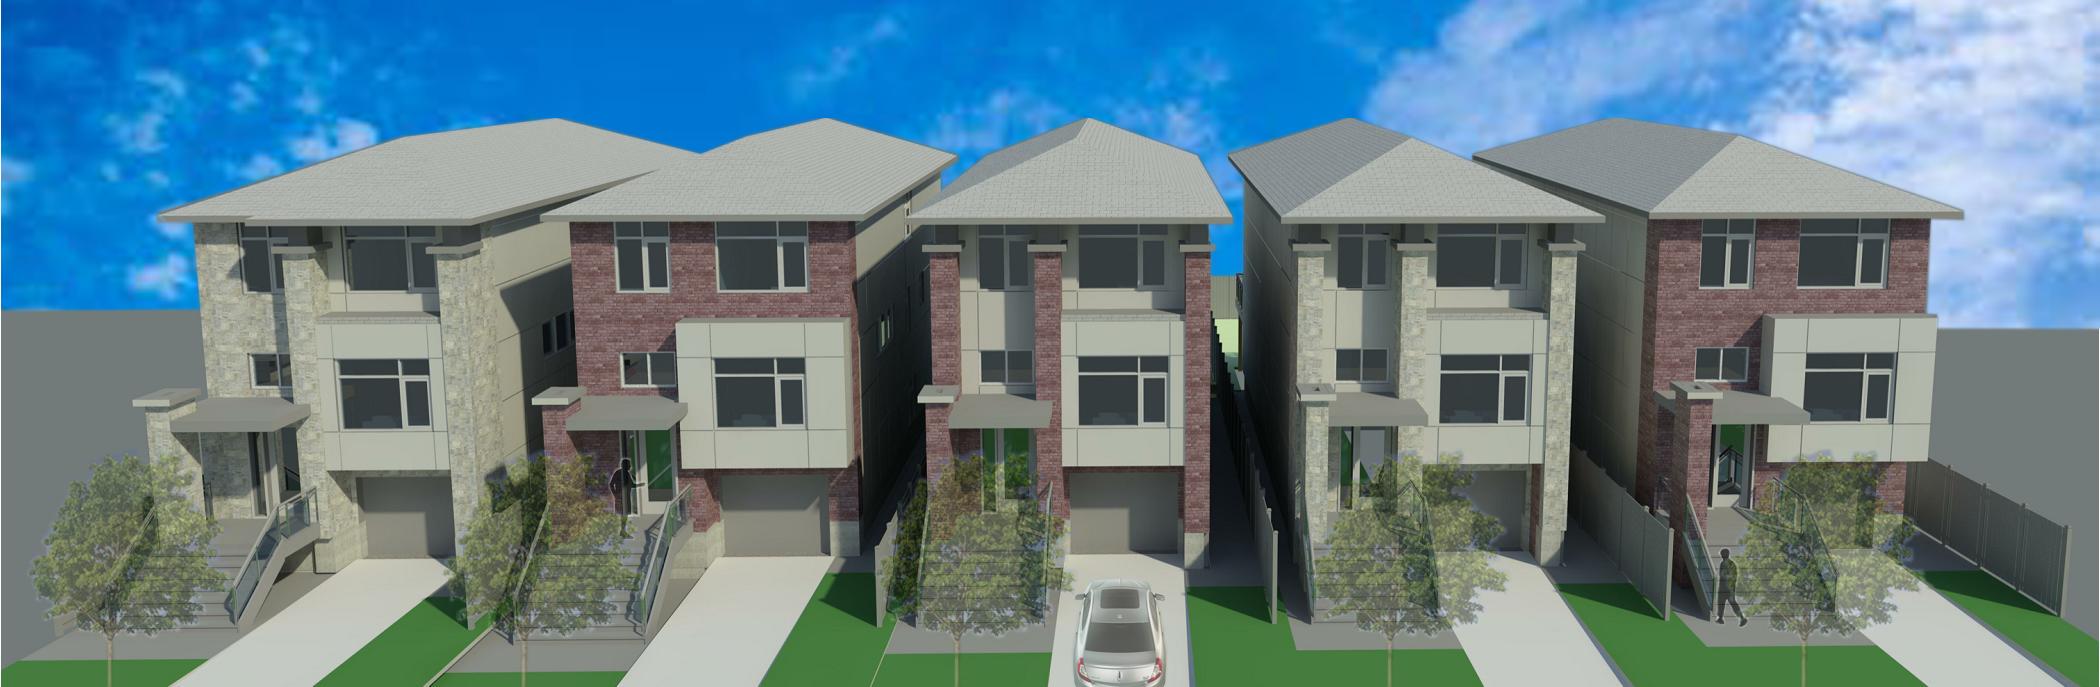 8 Melville Dr | Custom Build Home in Barrhaven